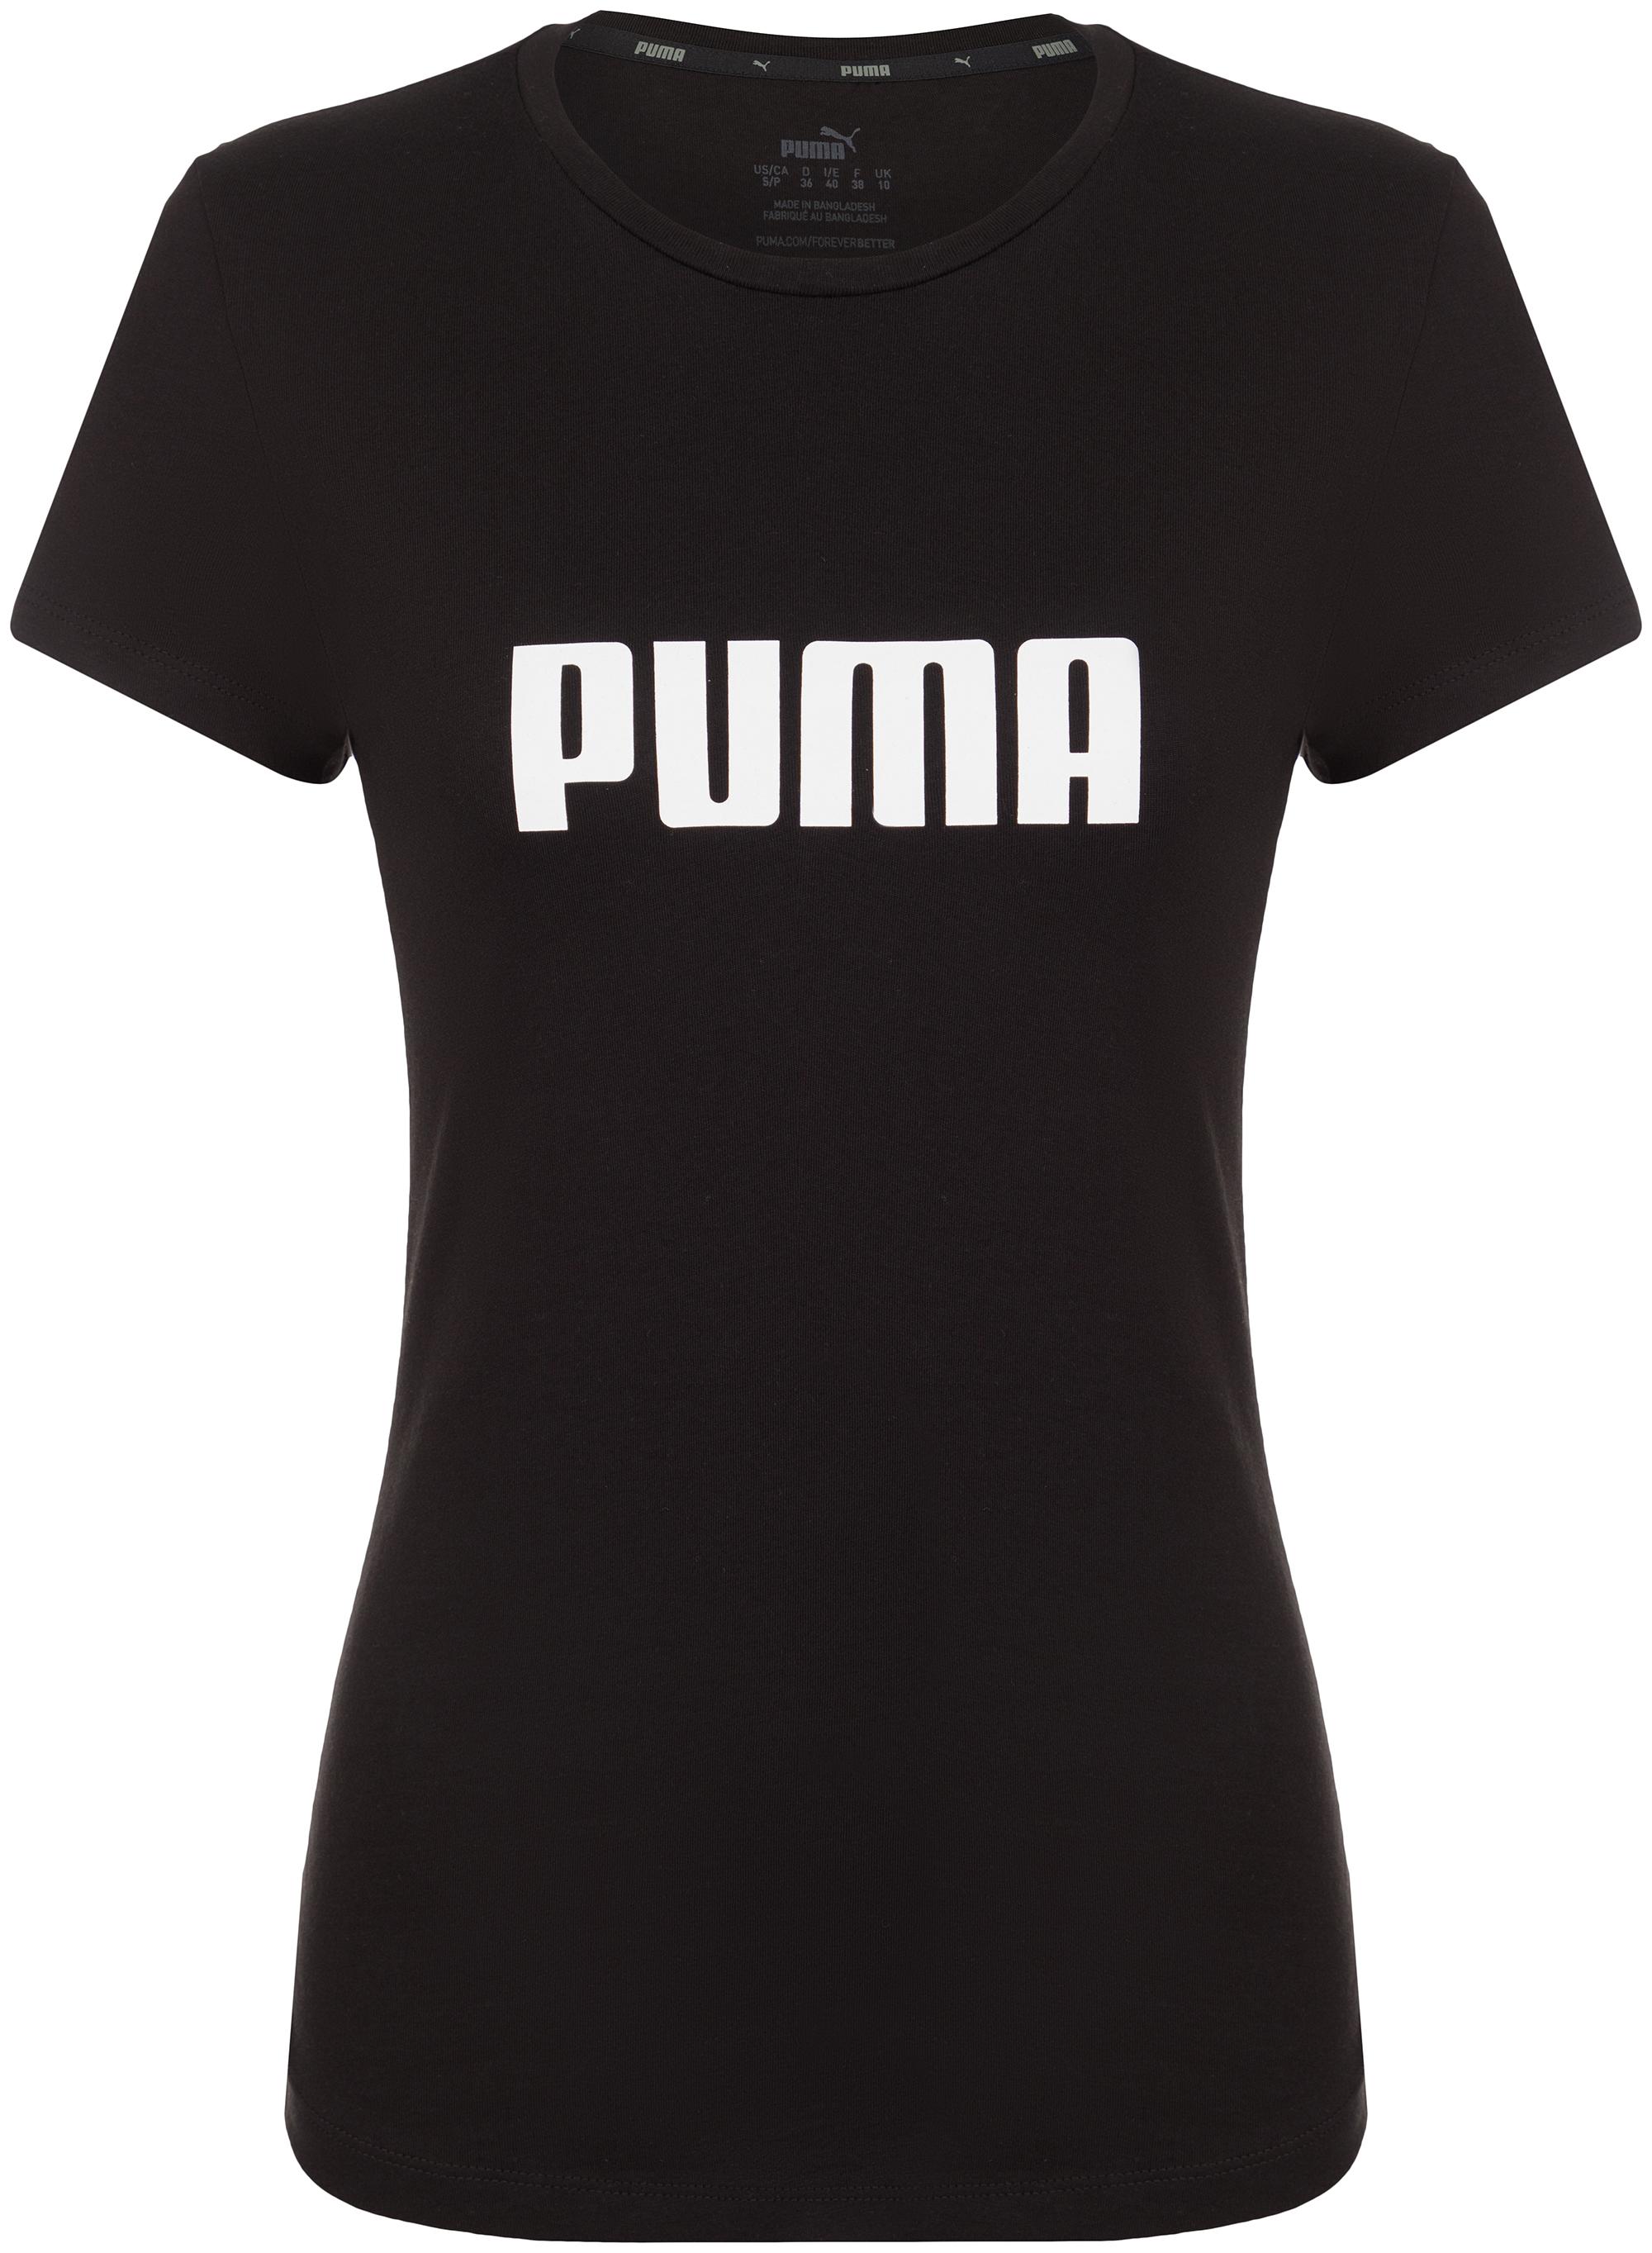 Puma Футболка женская Puma ESS Logo, размер 42-44 брюки спортивные puma ess jersey pants w